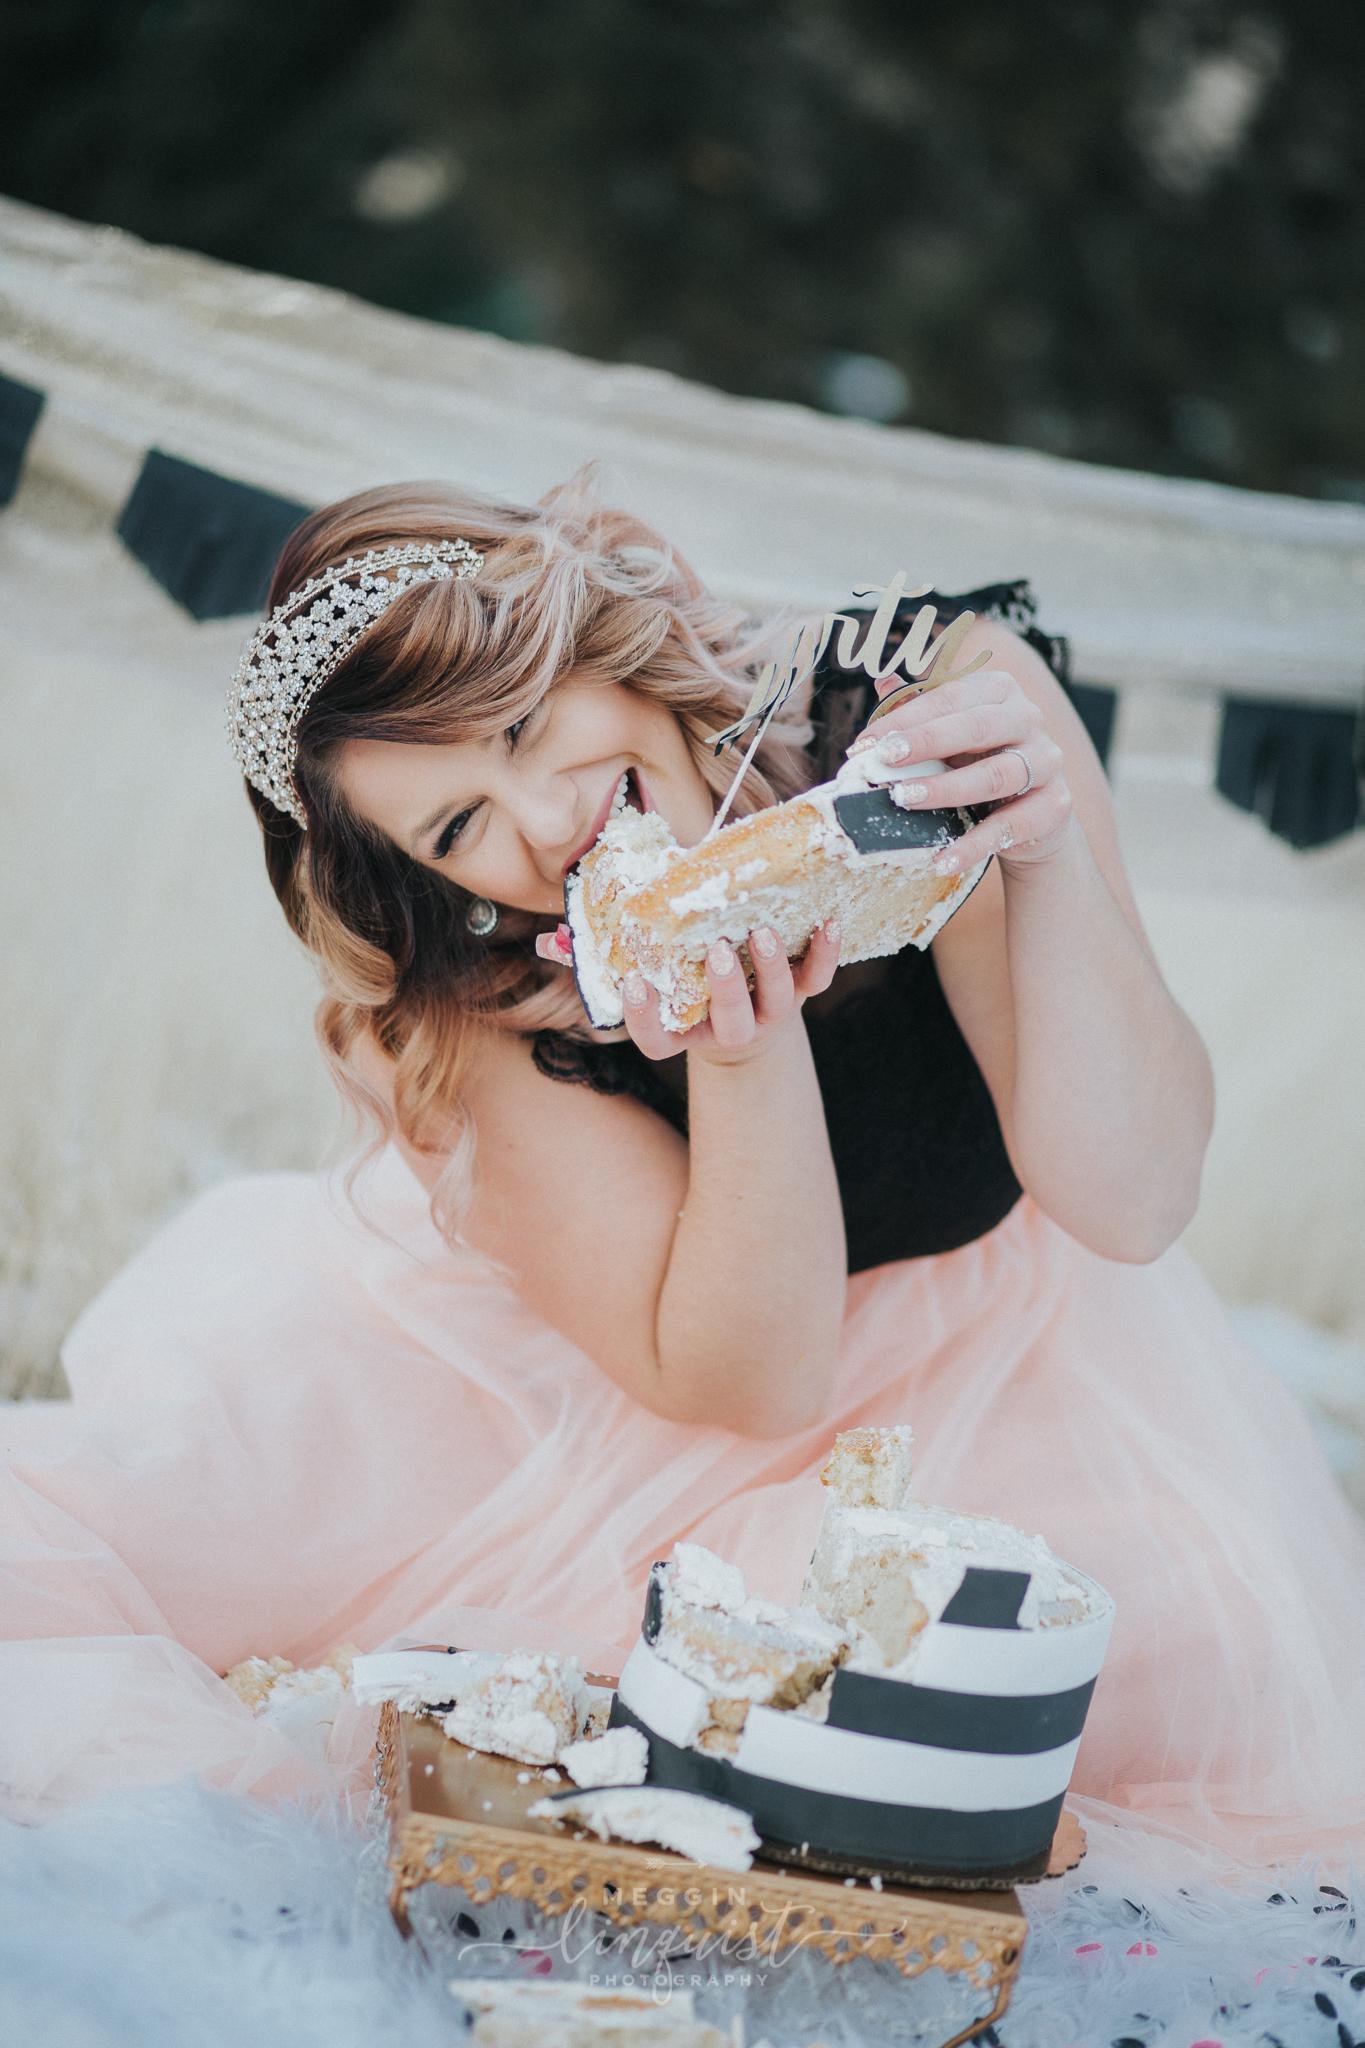 30th-birthday-cake-smash-reno-lake-tahoe-photographer-23.jpg